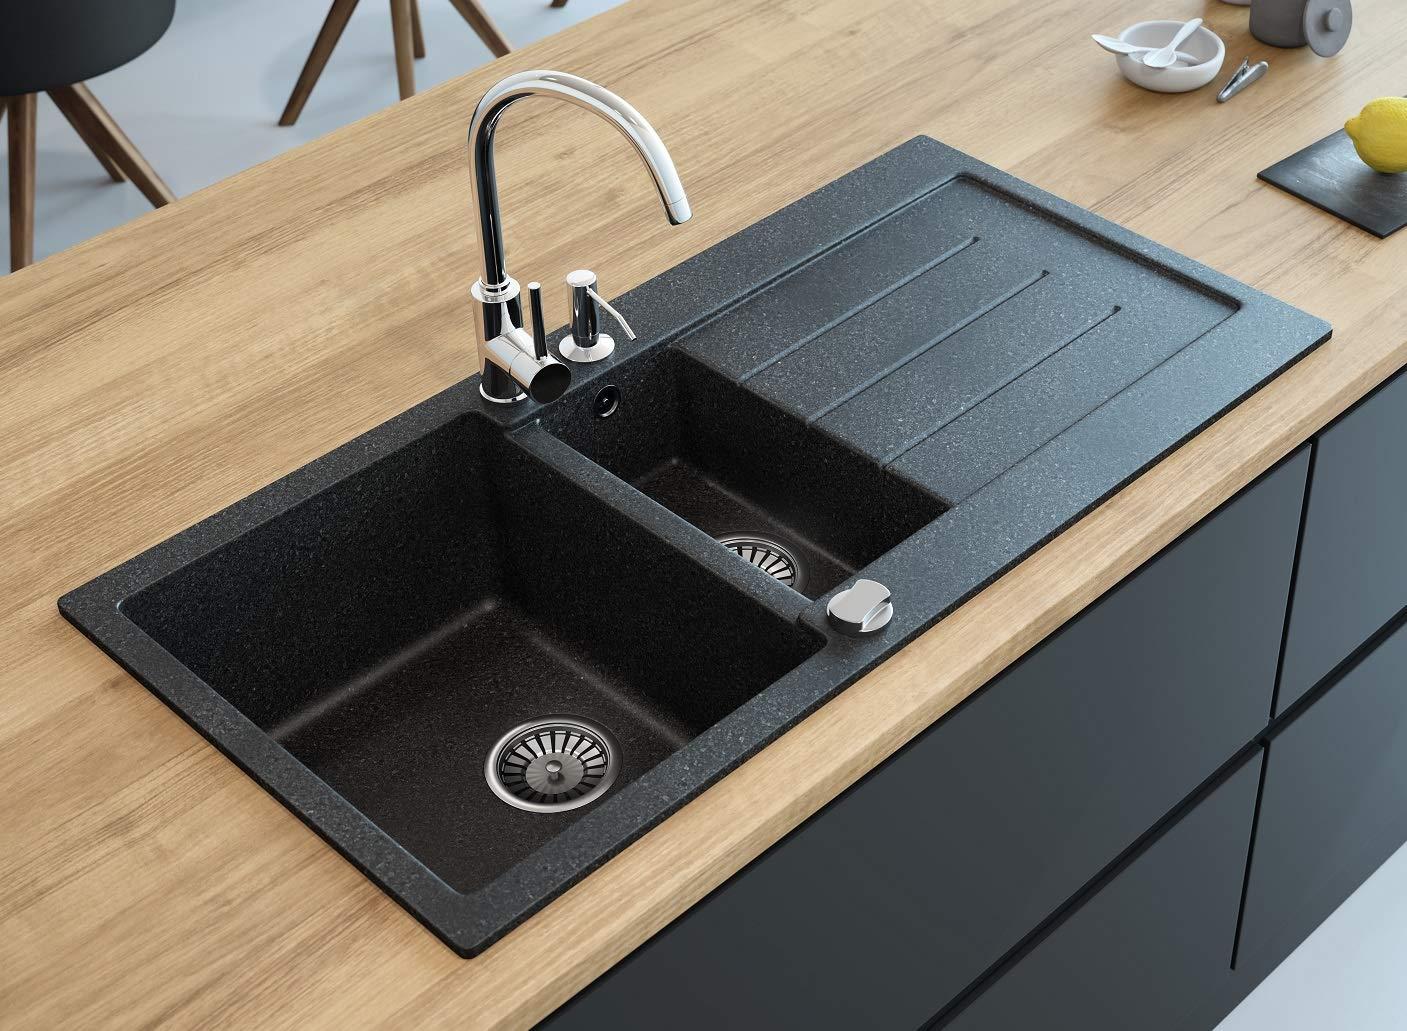 Black Kitchen Sink Lavello Decoro 150LT 39'' Granite Sink Composite Double Bowl Big Range of Kitchen Sinks Drop In Top Mount